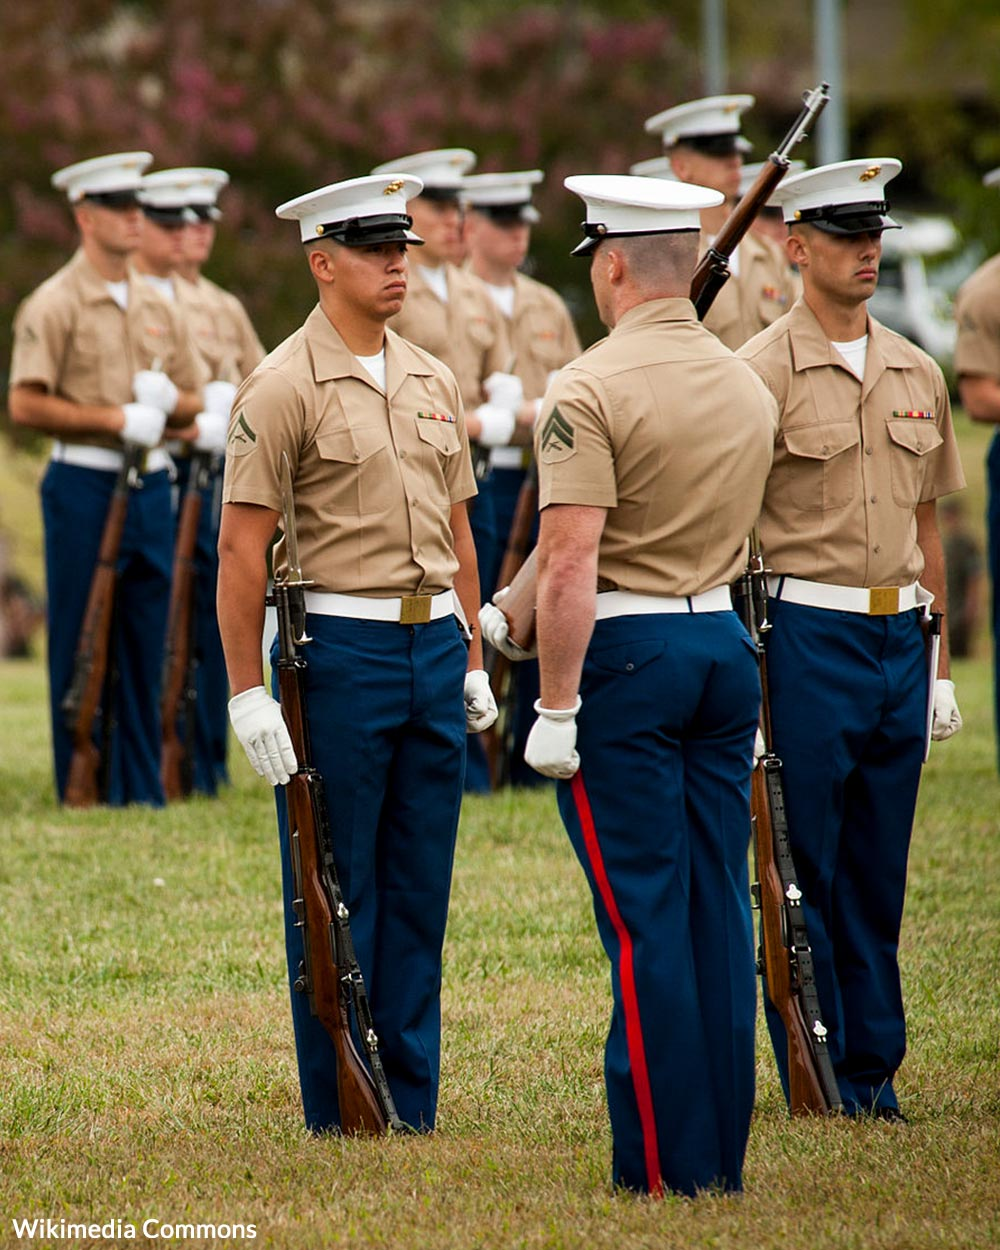 The United States Marine Corps Silent drill Platoon performs at the United States Marine Corps Enlisted Awards Parade and Presentation held at Lejeune Hall, Marine Corps Base Quantico, Va.